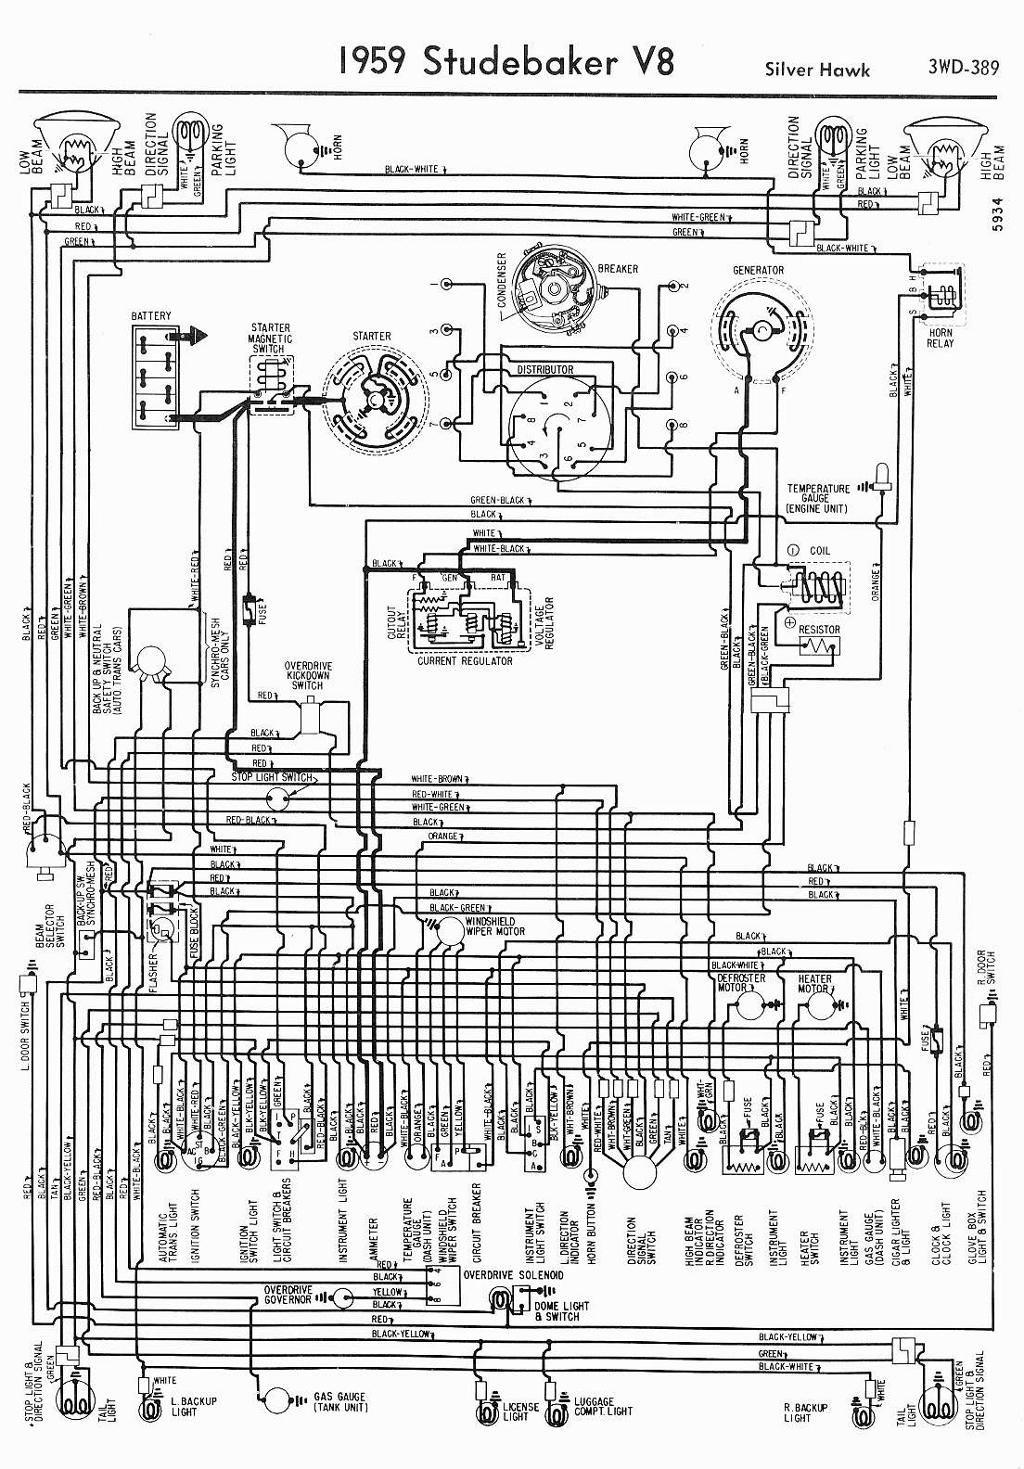 hight resolution of studebaker engine diagrams wiring diagram data val related image studebaker blueprints drawings diagram 1954